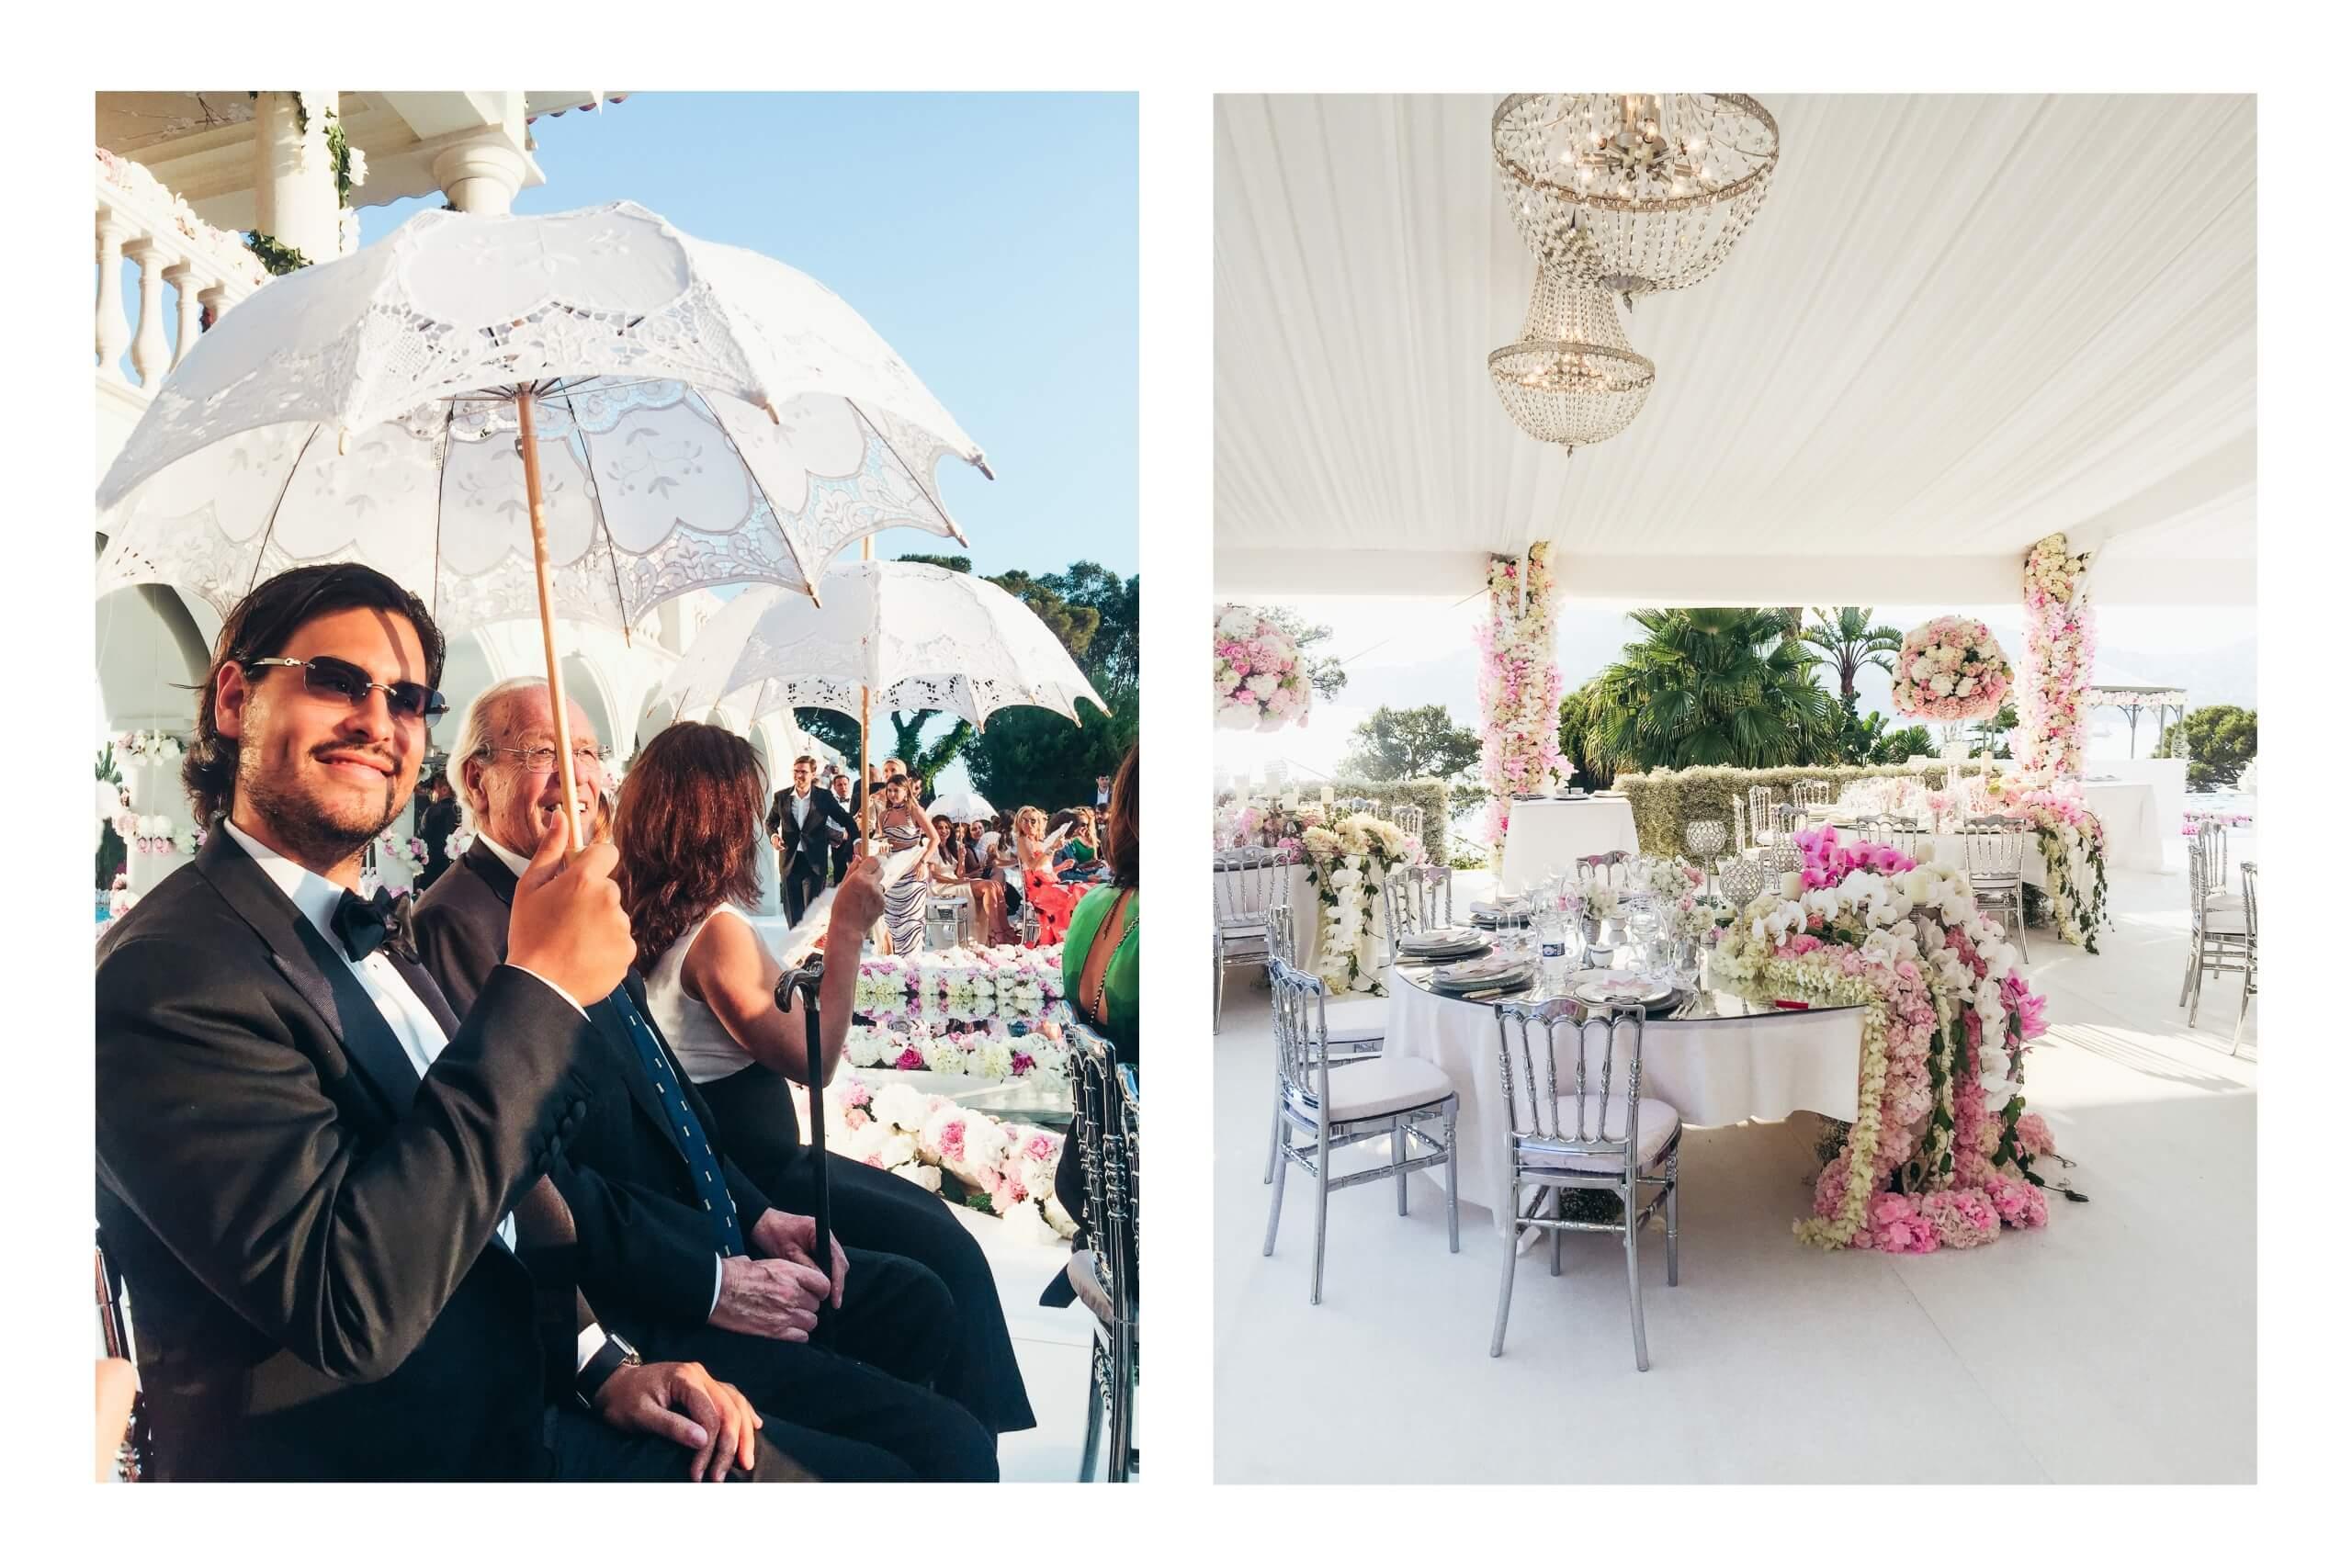 janni-deler-dream-weddingIMG_2953 copy